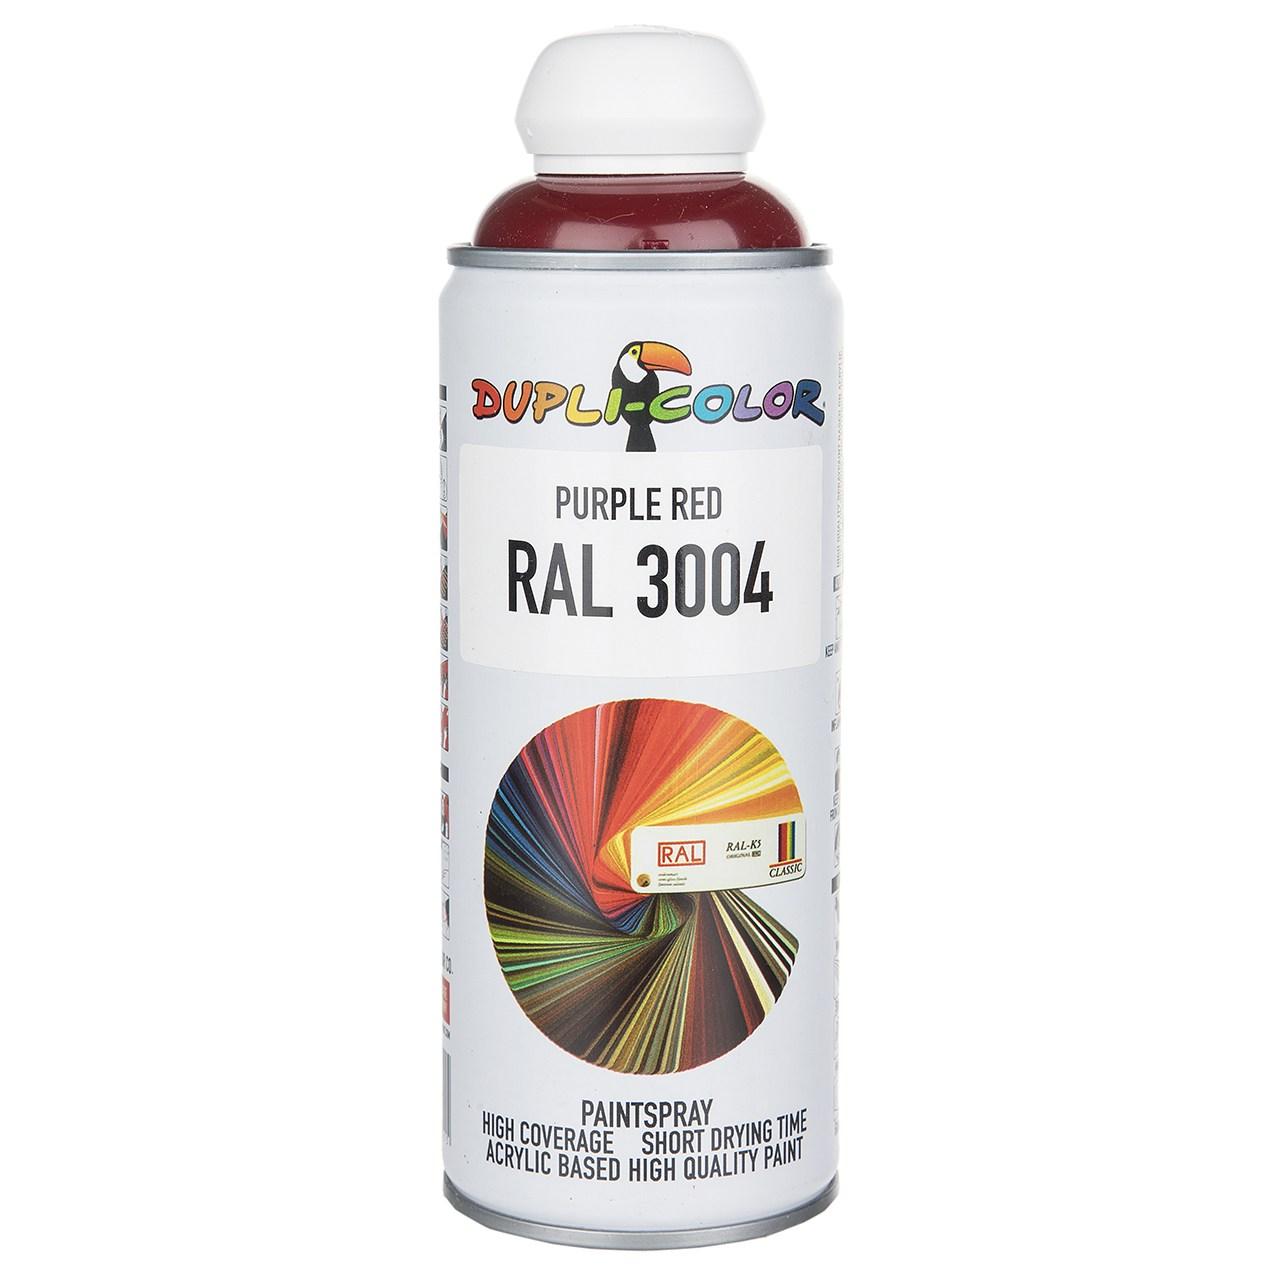 اسپری رنگ آلبالویی دوپلی کالر مدل RAL 3004 حجم 400 میلی لیتر